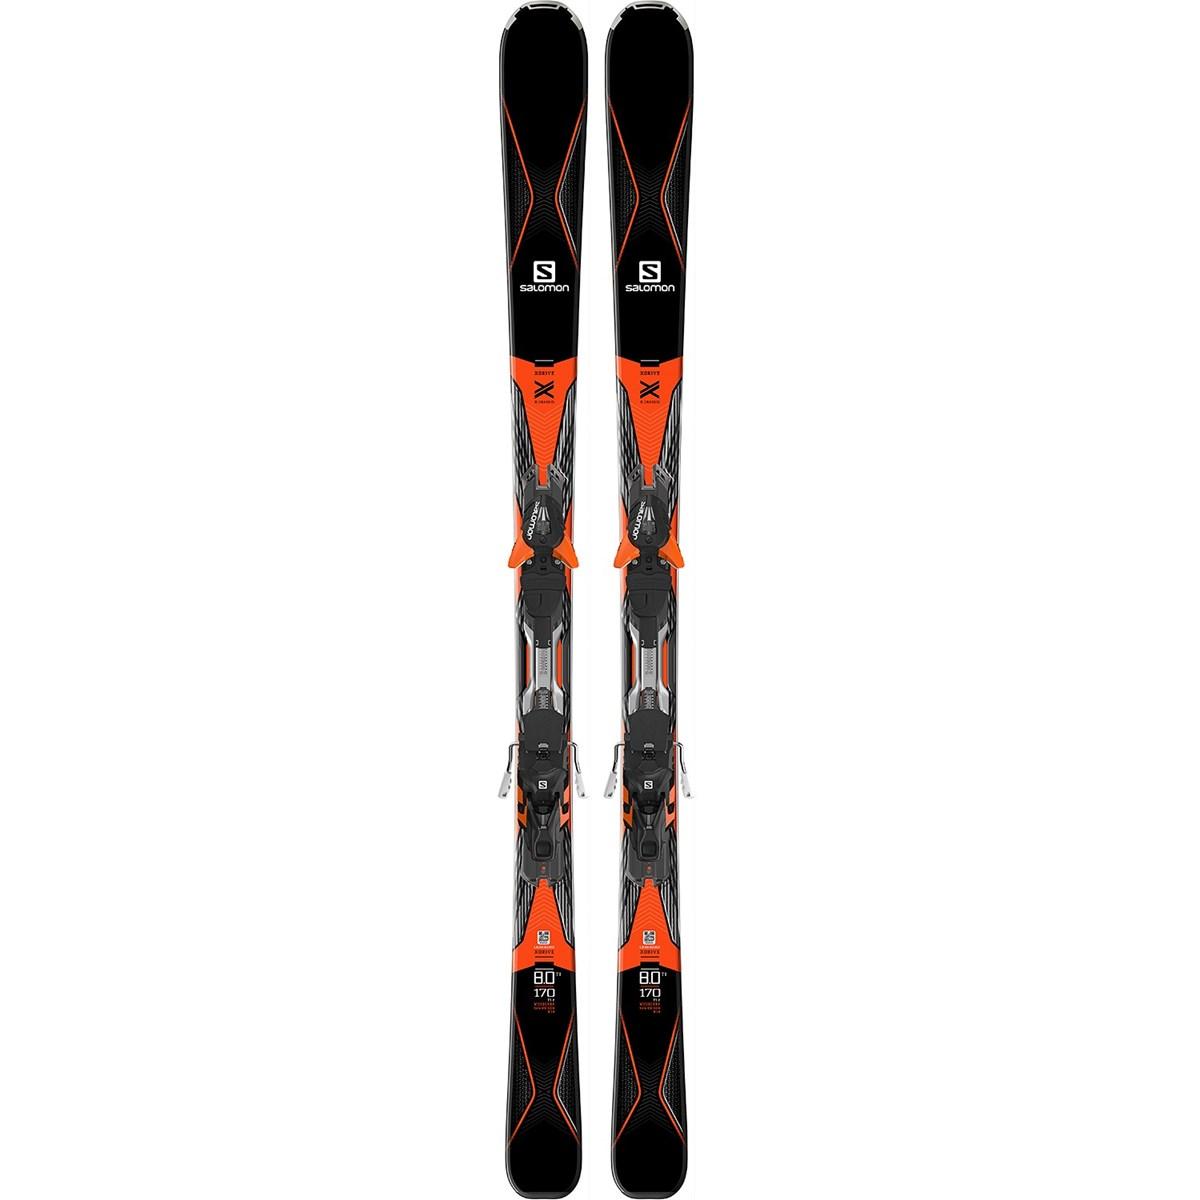 Salomon X Drive 8.0 Ti Mens 2017 Skis With XT12 Bindings